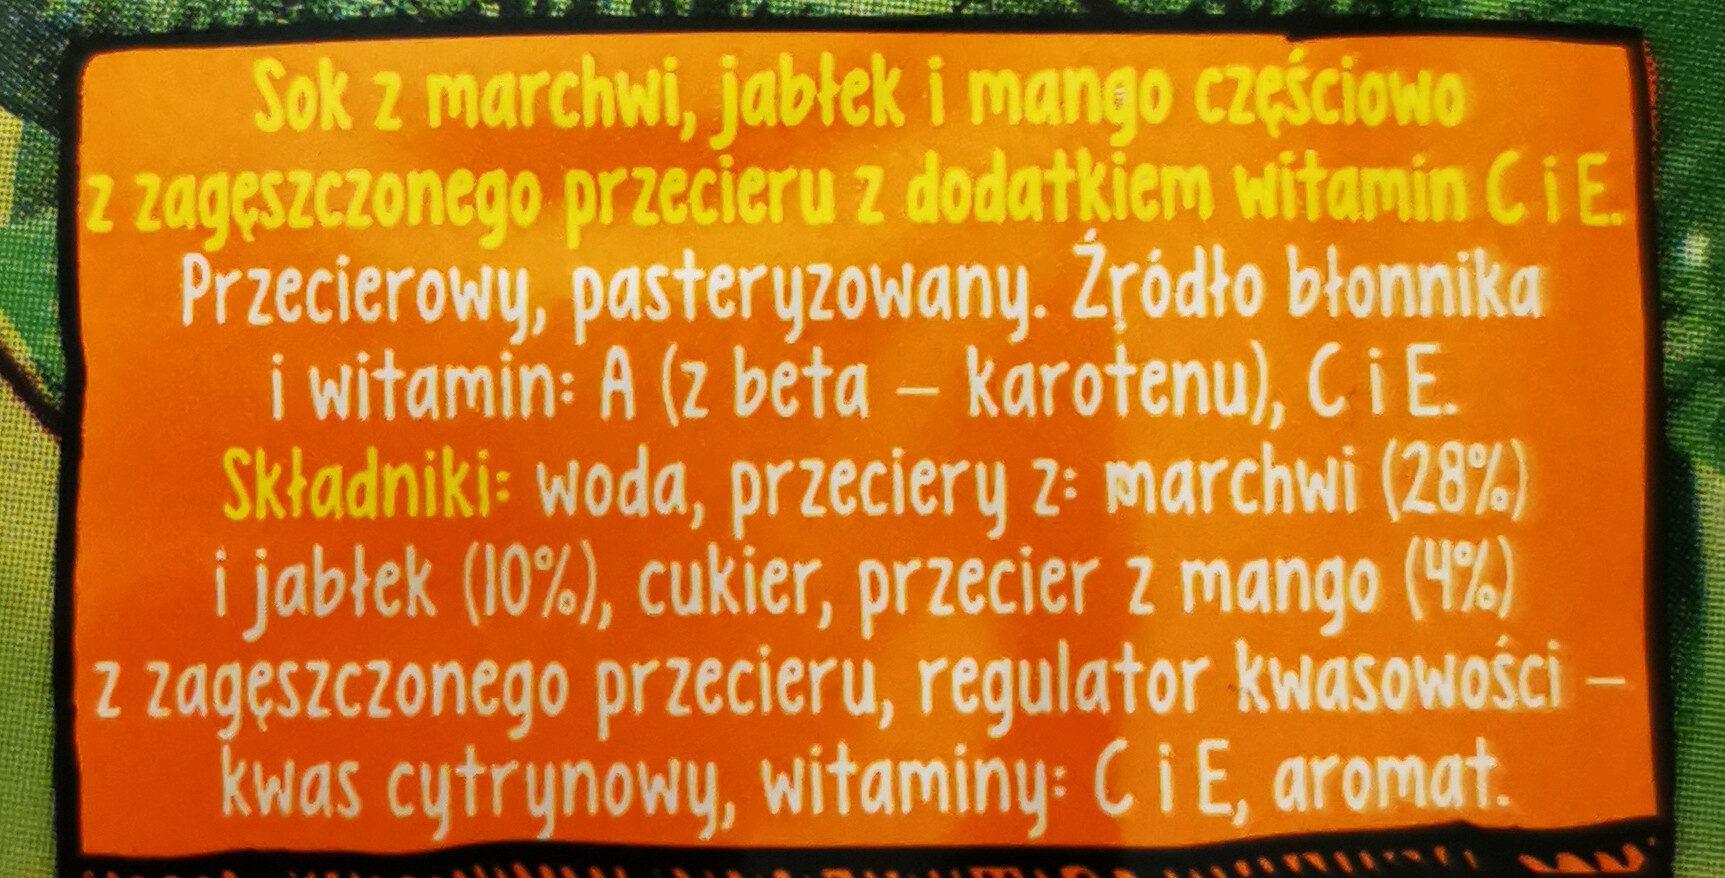 vita MINI mango, marchew, jabłko - Składniki